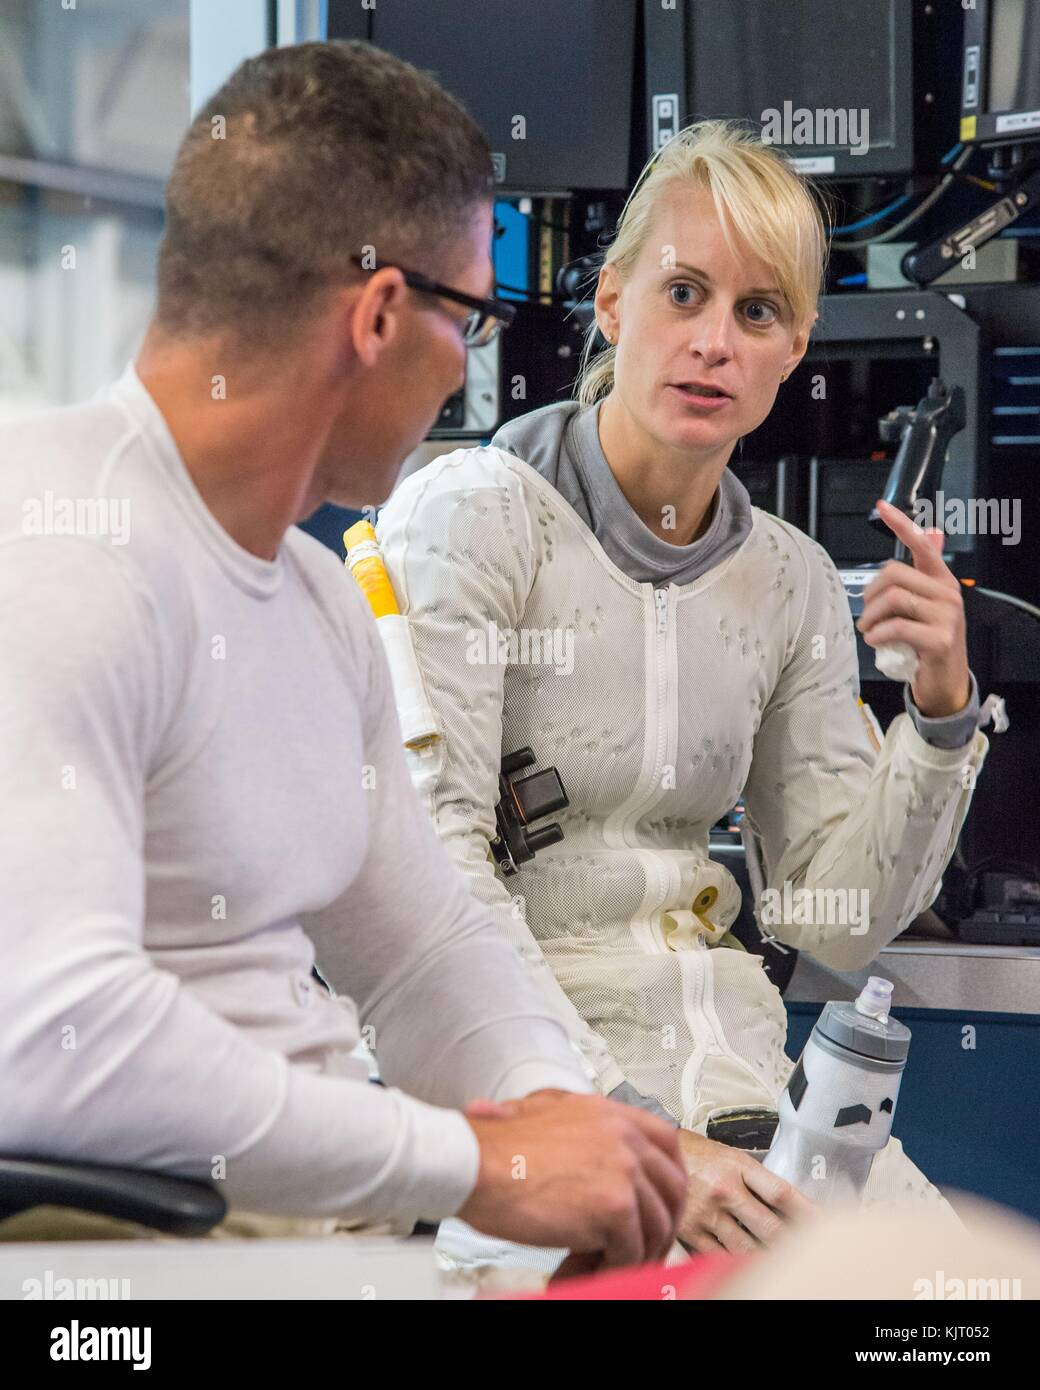 NASA astronauts Mike Hopkins (left) and Kathleen Rubins talk poolside before underwater microgravity spacewalk simulation - Stock Image